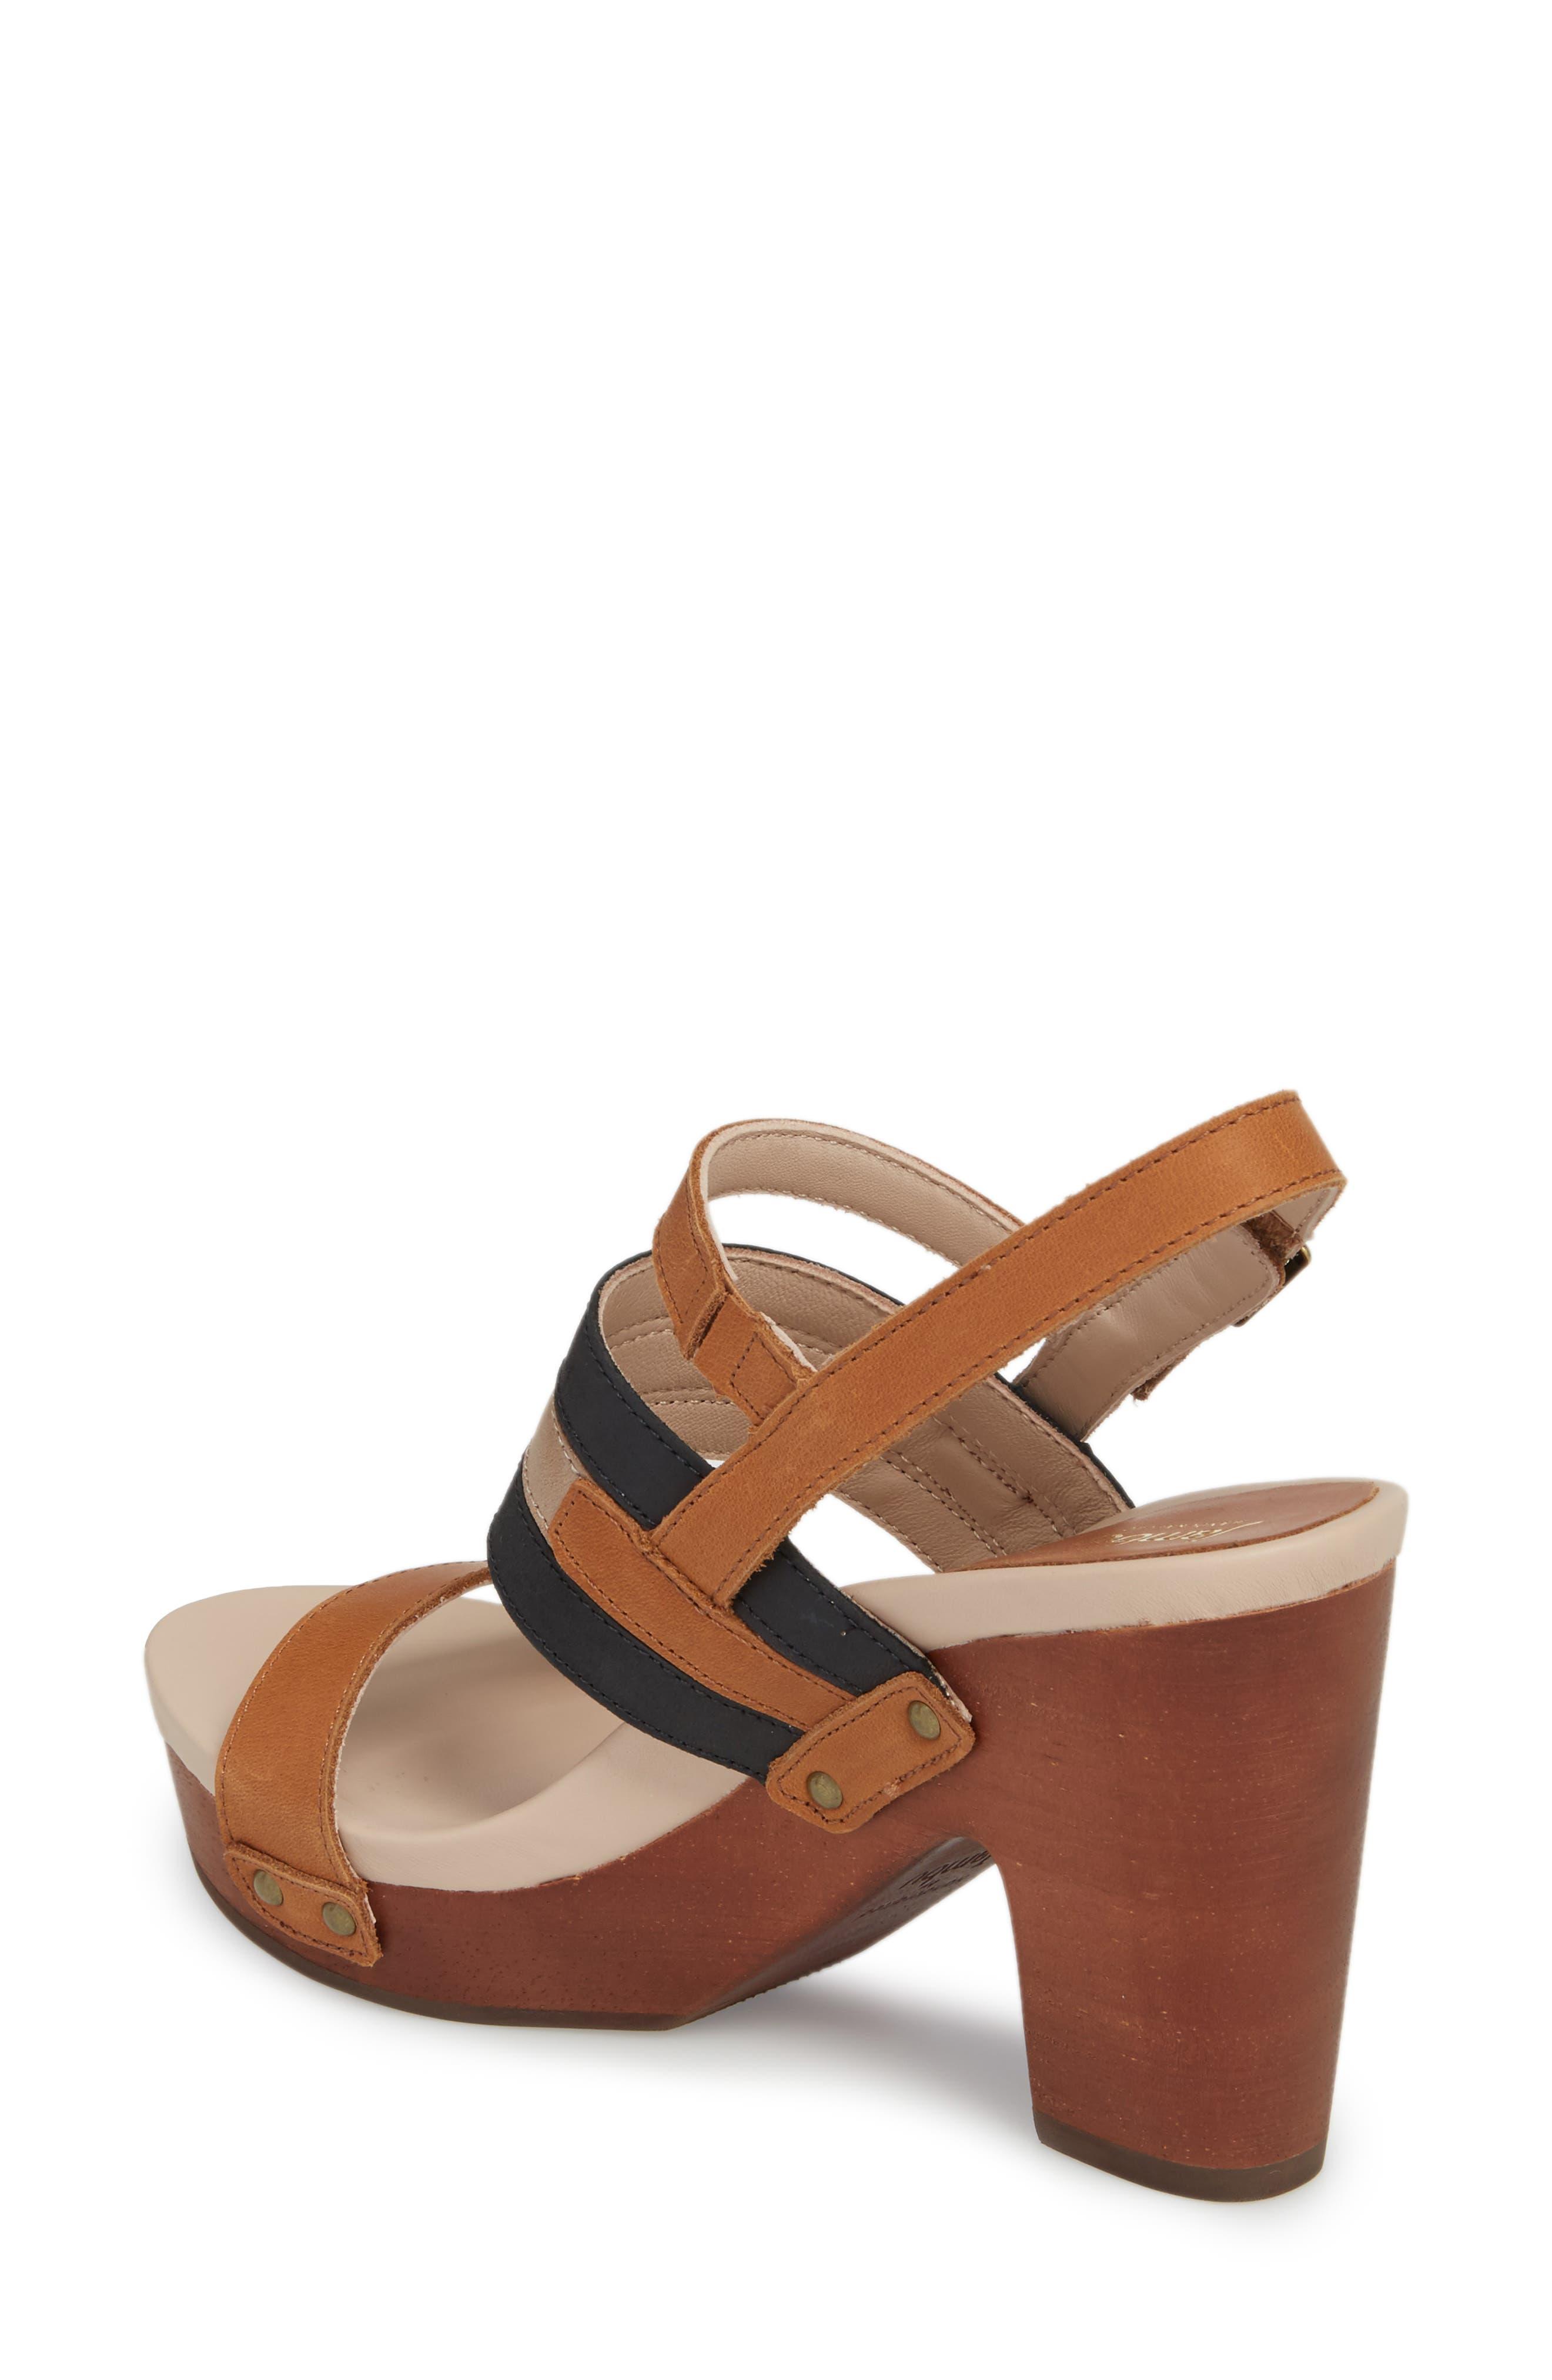 Viola Platform Sandal,                             Alternate thumbnail 2, color,                             200